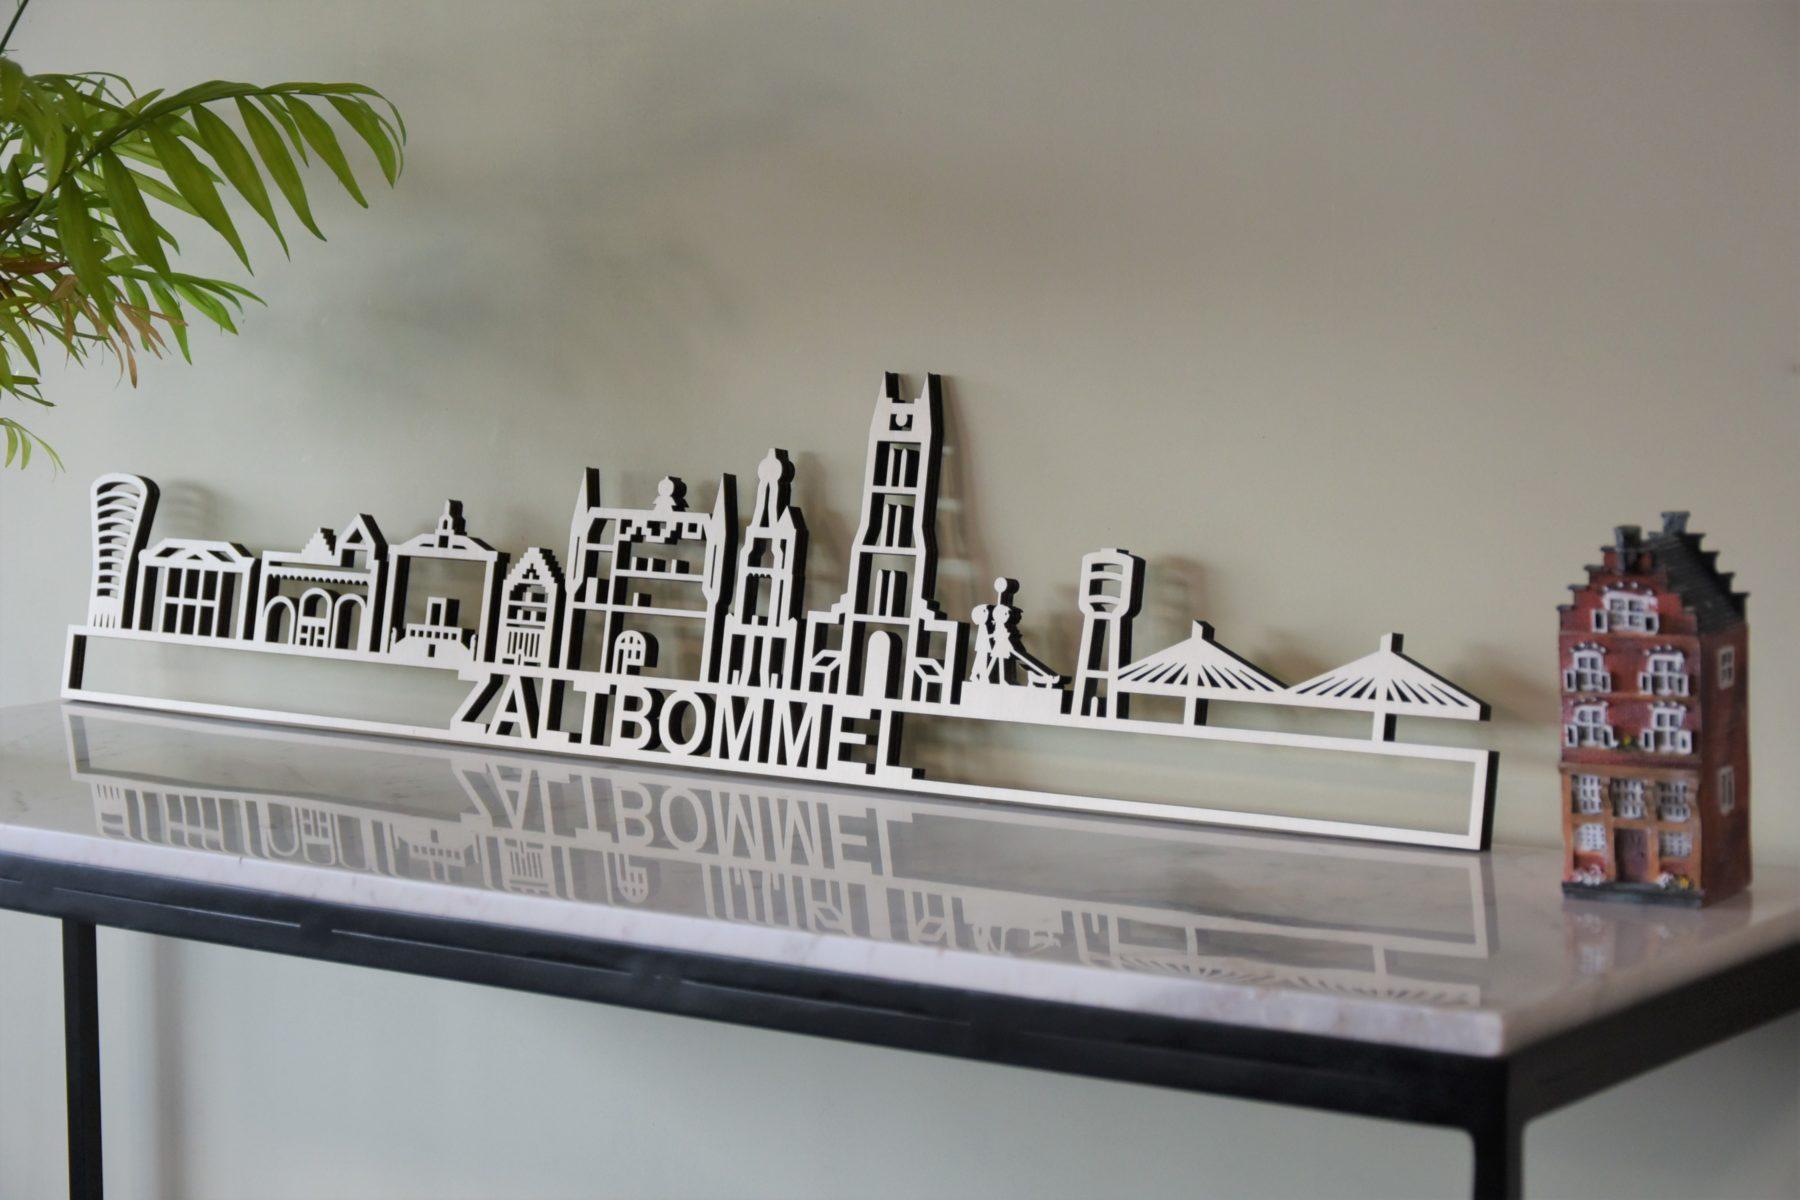 Zaltbommel skyline populierenhout